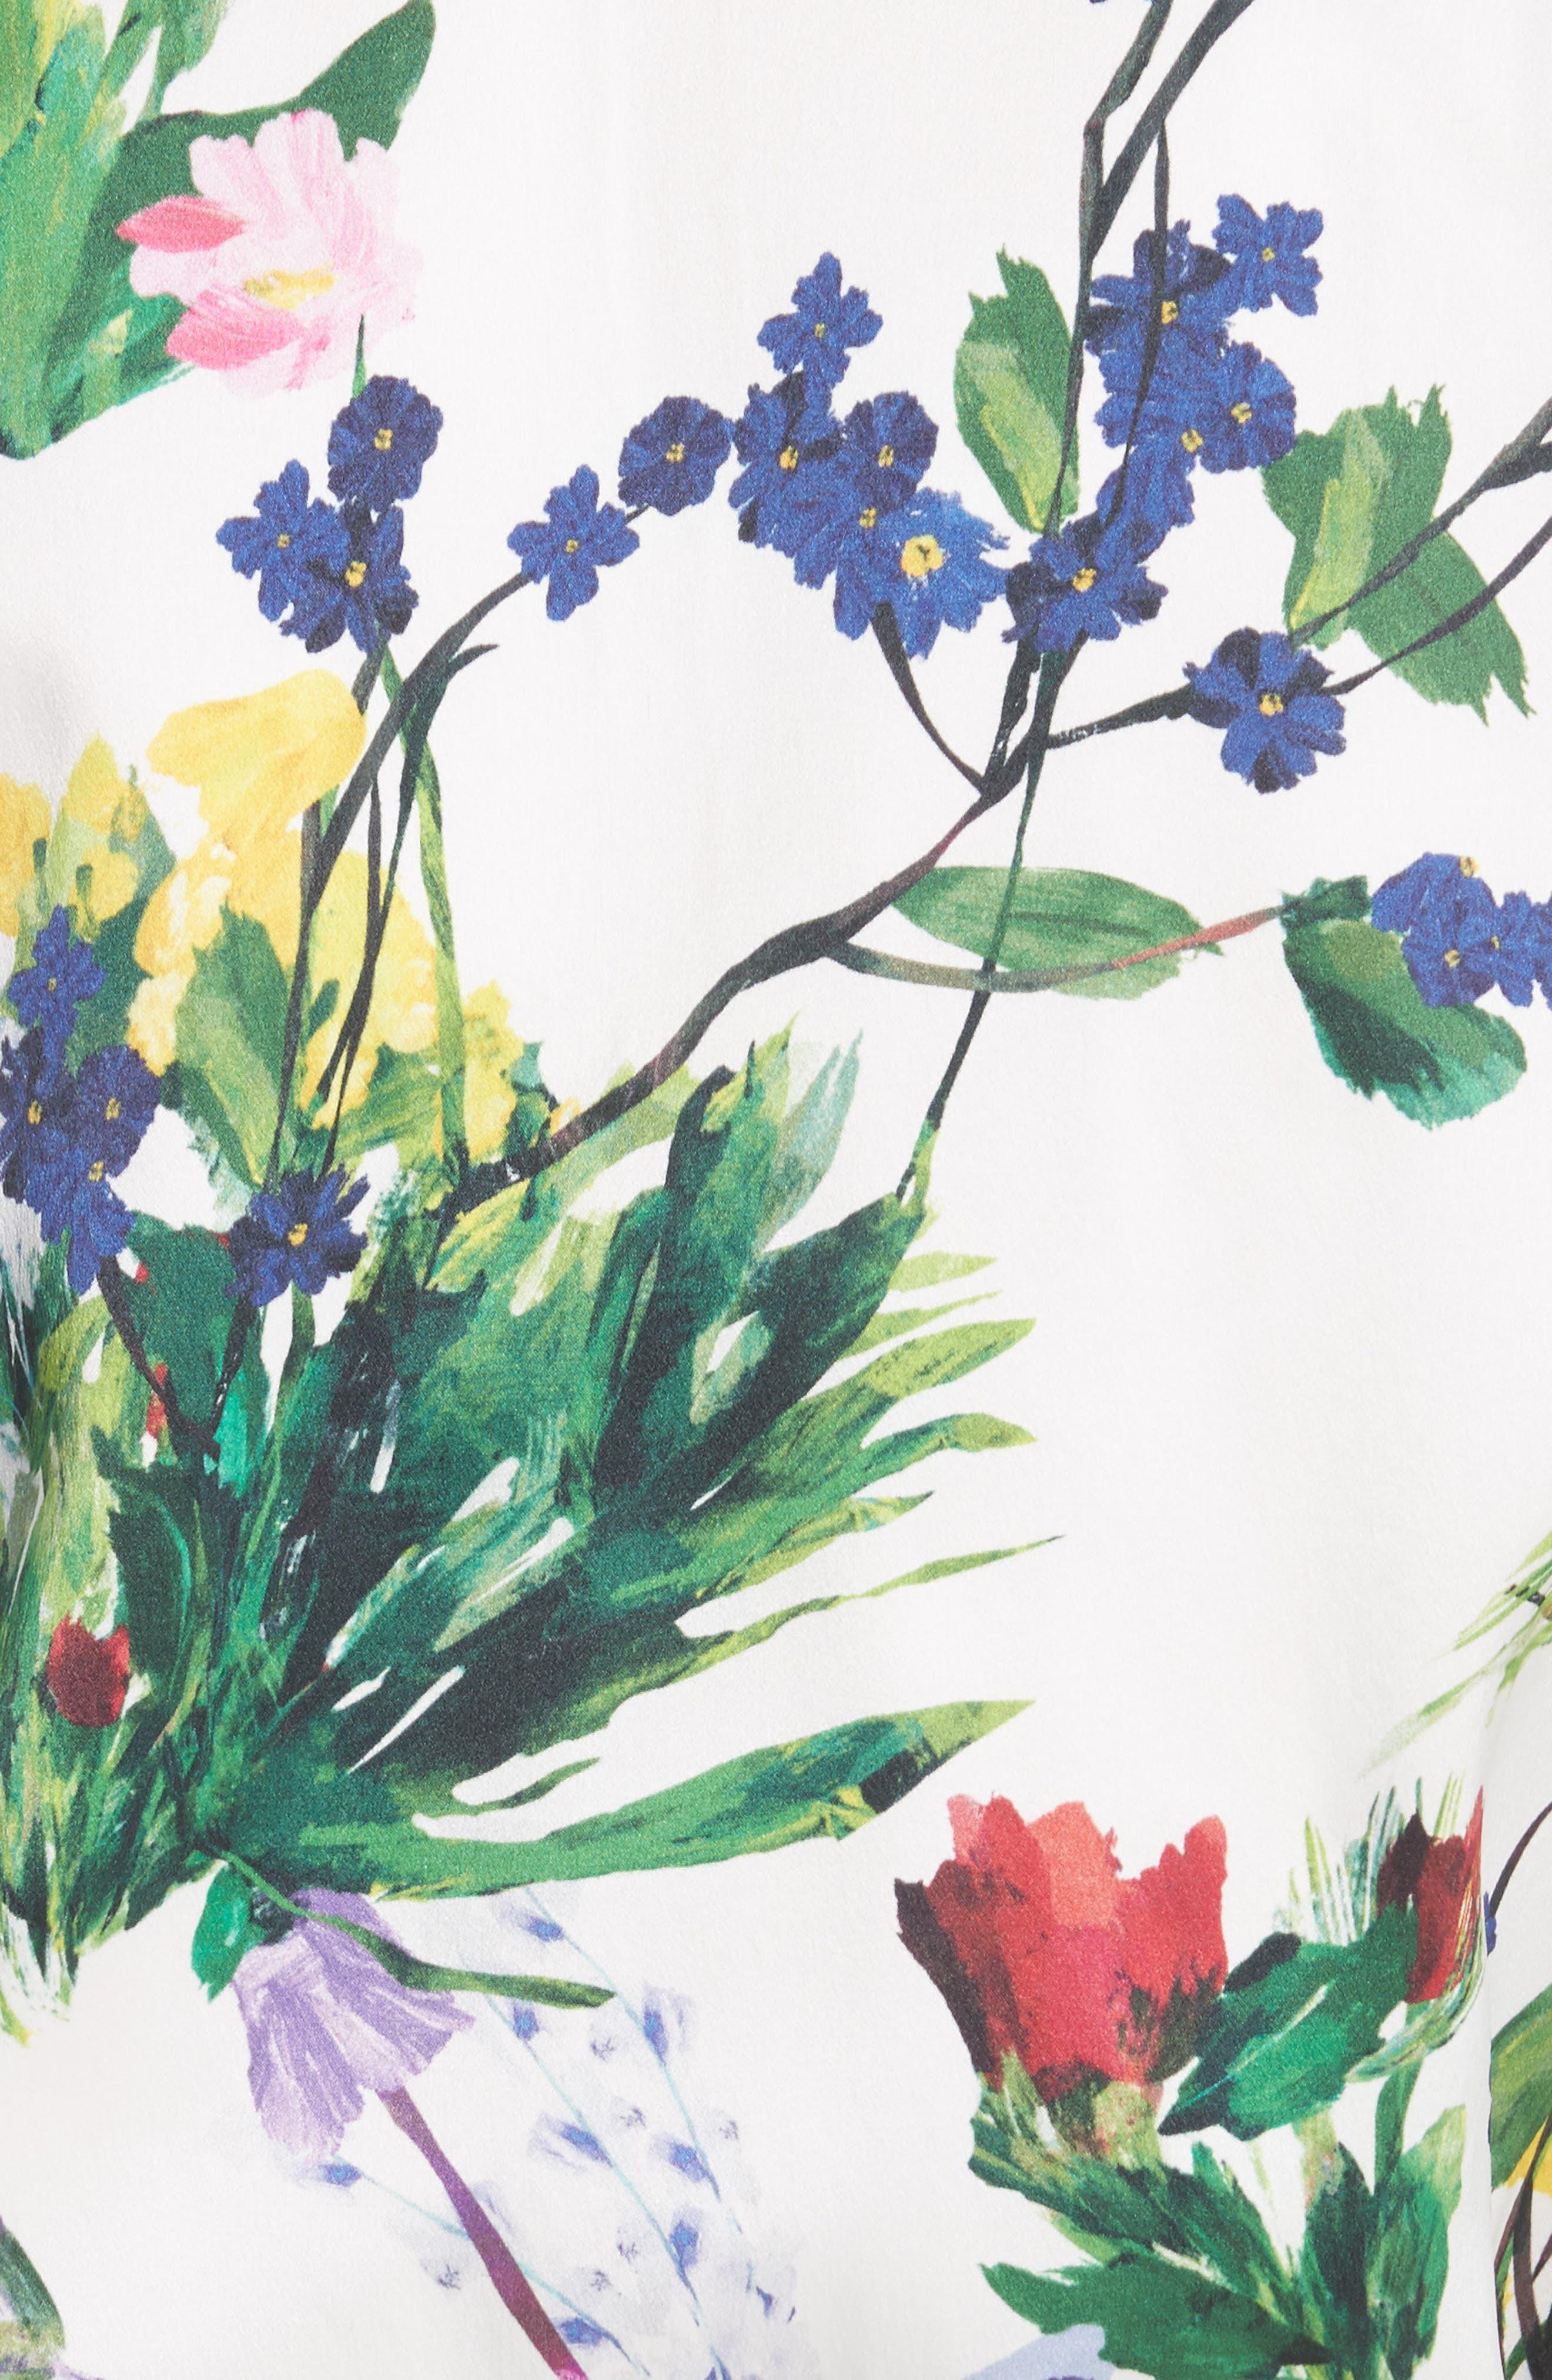 Lonnie Reversible Silk Bomber Jacket,                             Alternate thumbnail 5, color,                             Floral Damask/ Wildflower